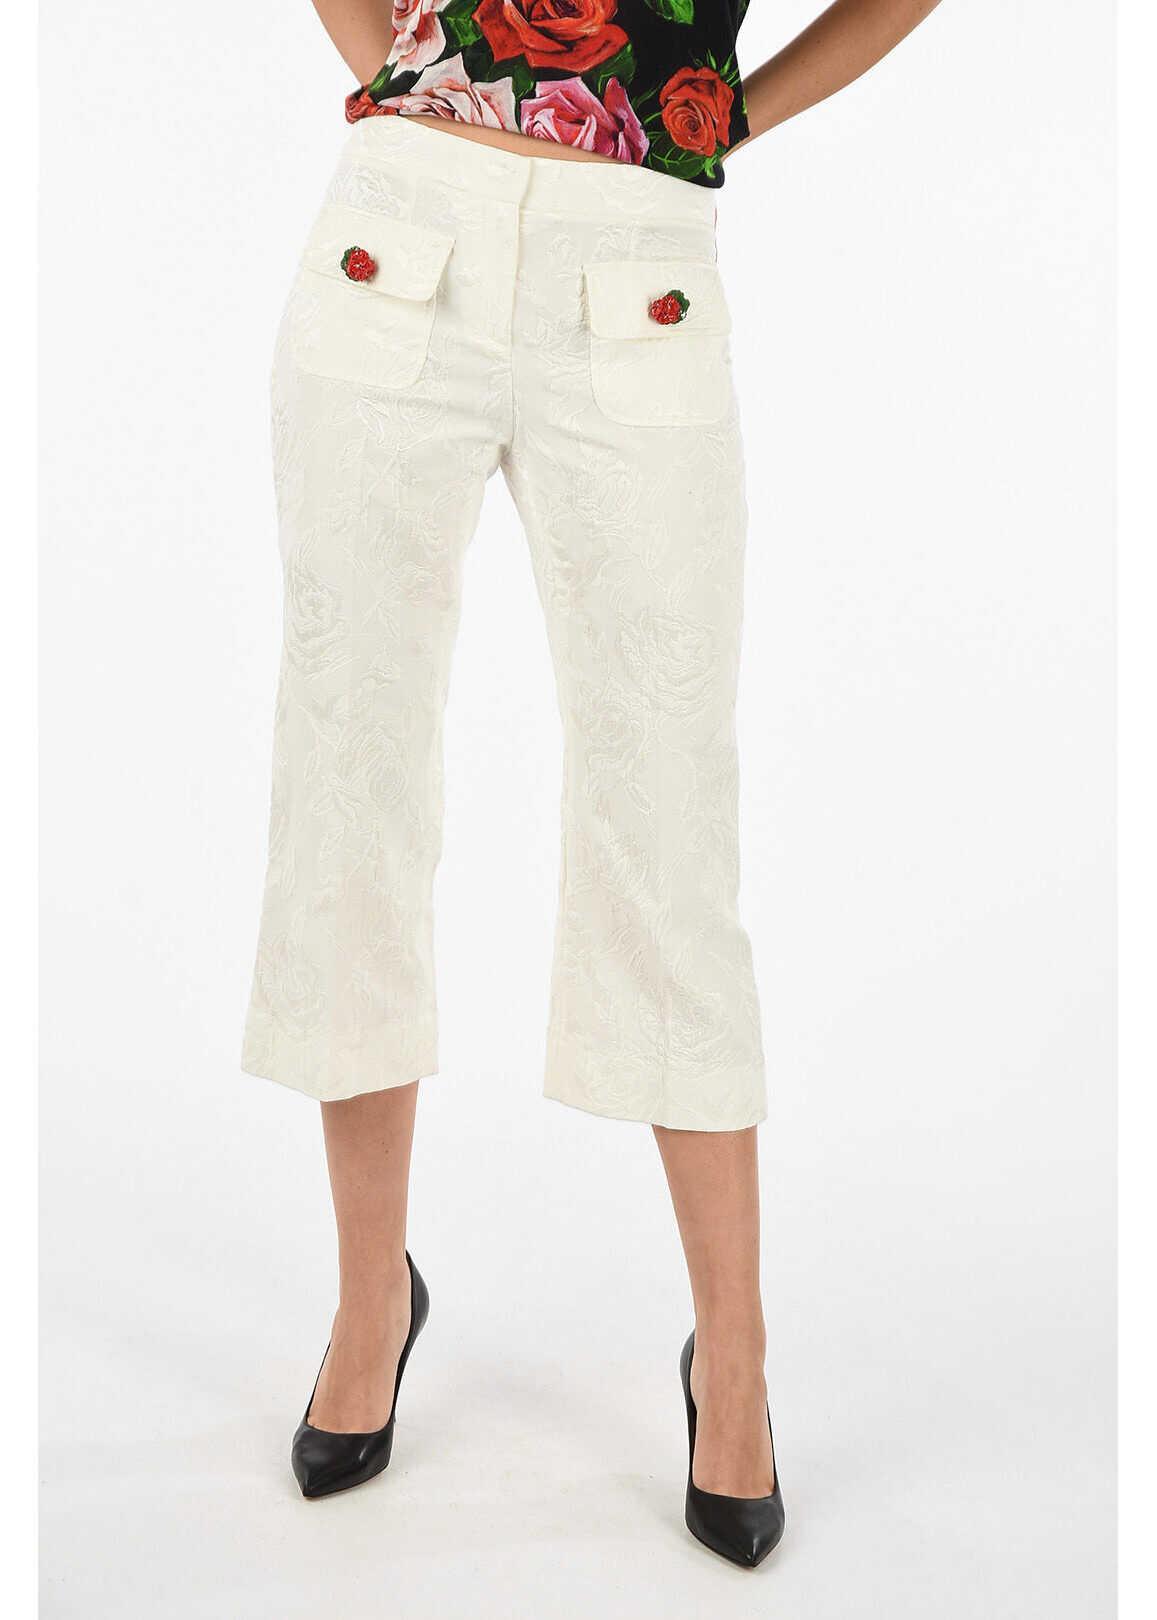 Dolce & Gabbana capri pants WHITE